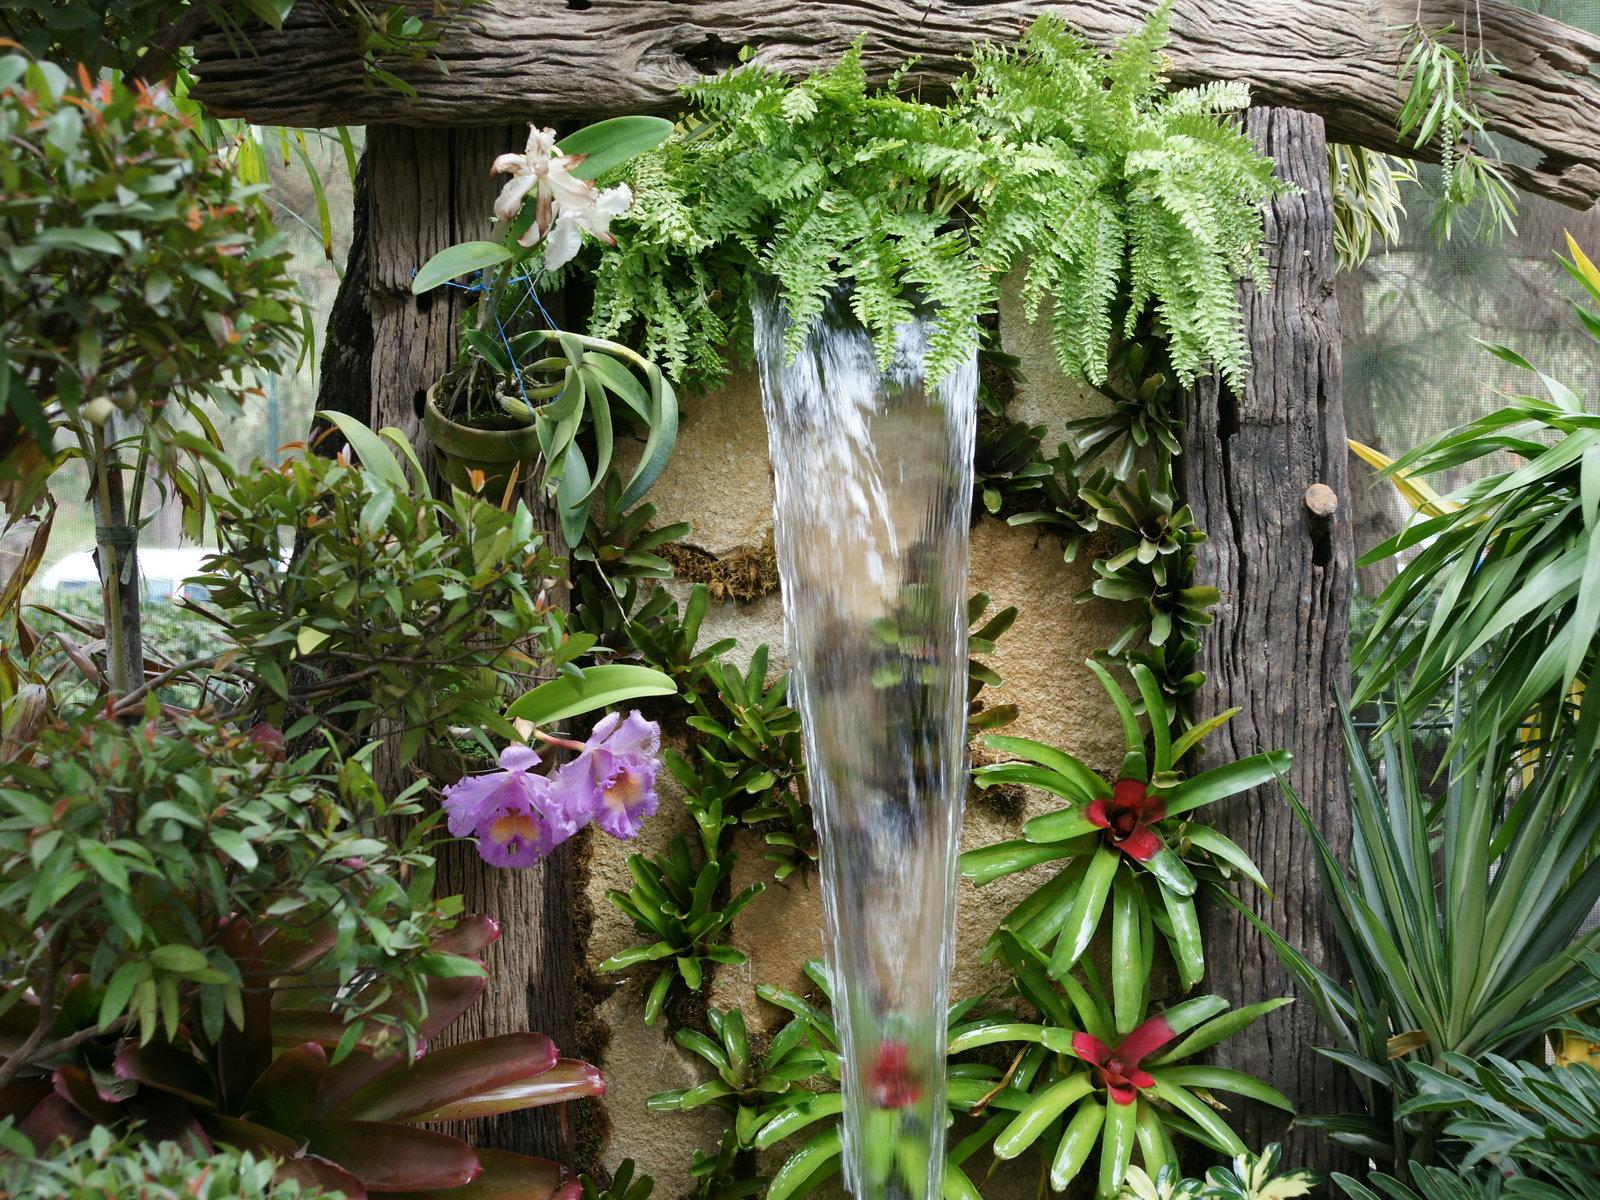 Jardines m s bellos fondos de pantalla for Tropical flower garden landscape designs